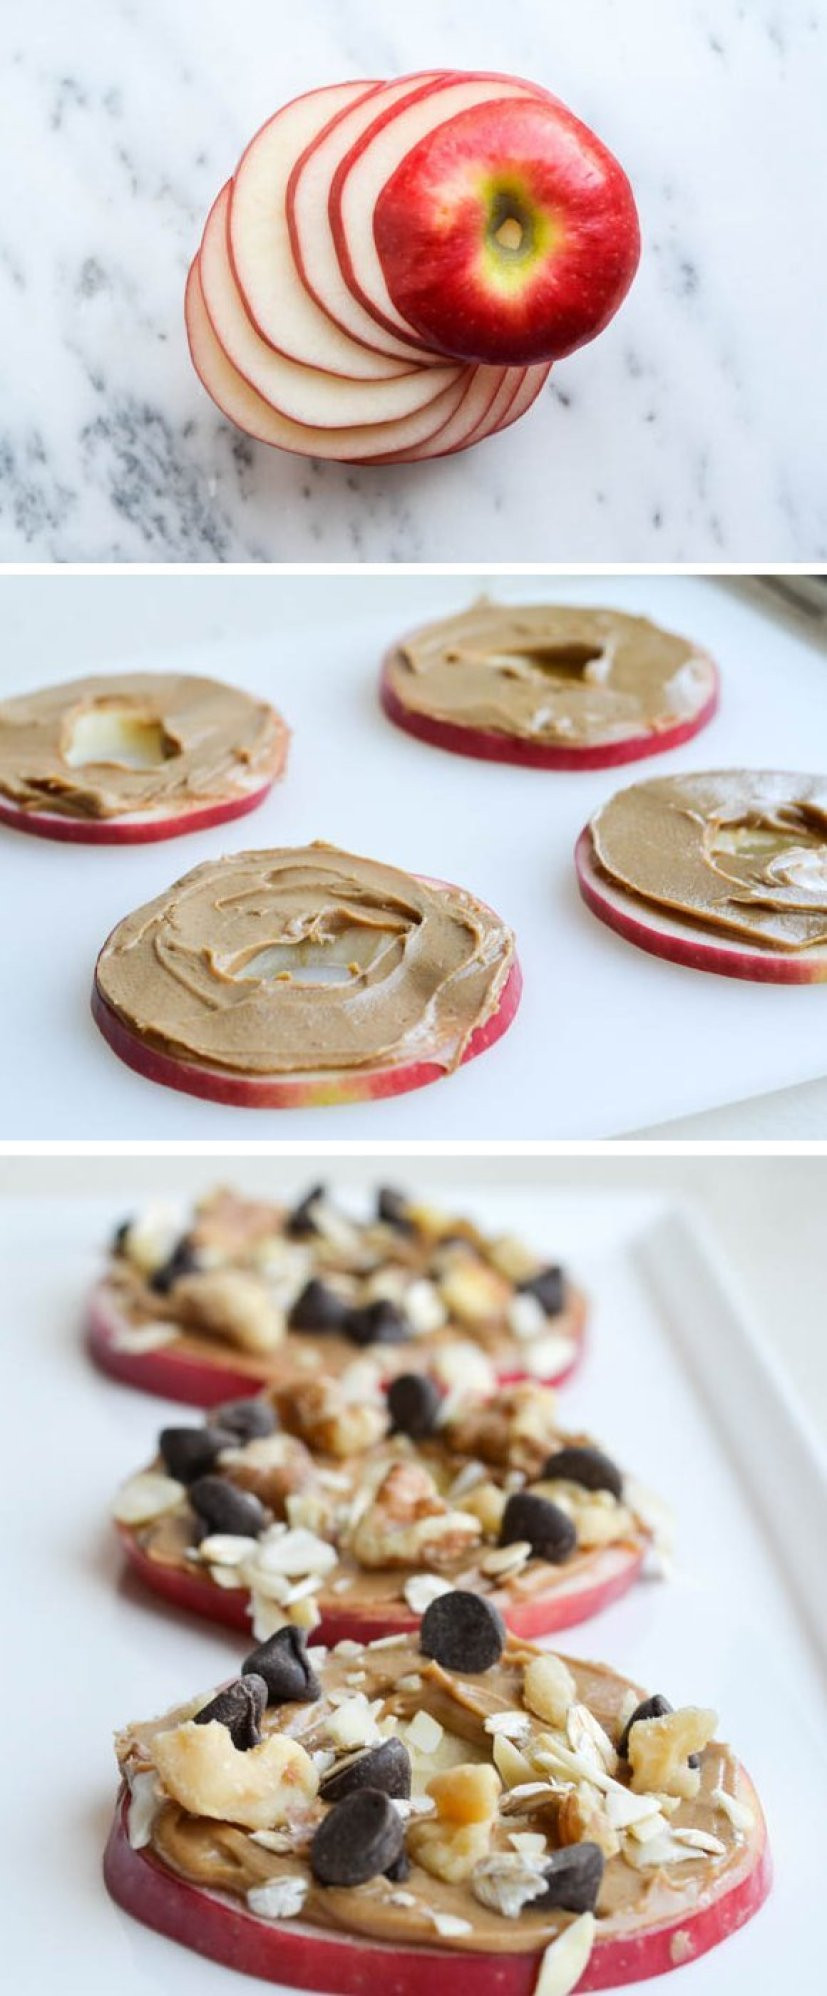 Fun Healthy Snacks For Kids  25 Fun and Healthy Snacks for Kids Uplifting Mayhem